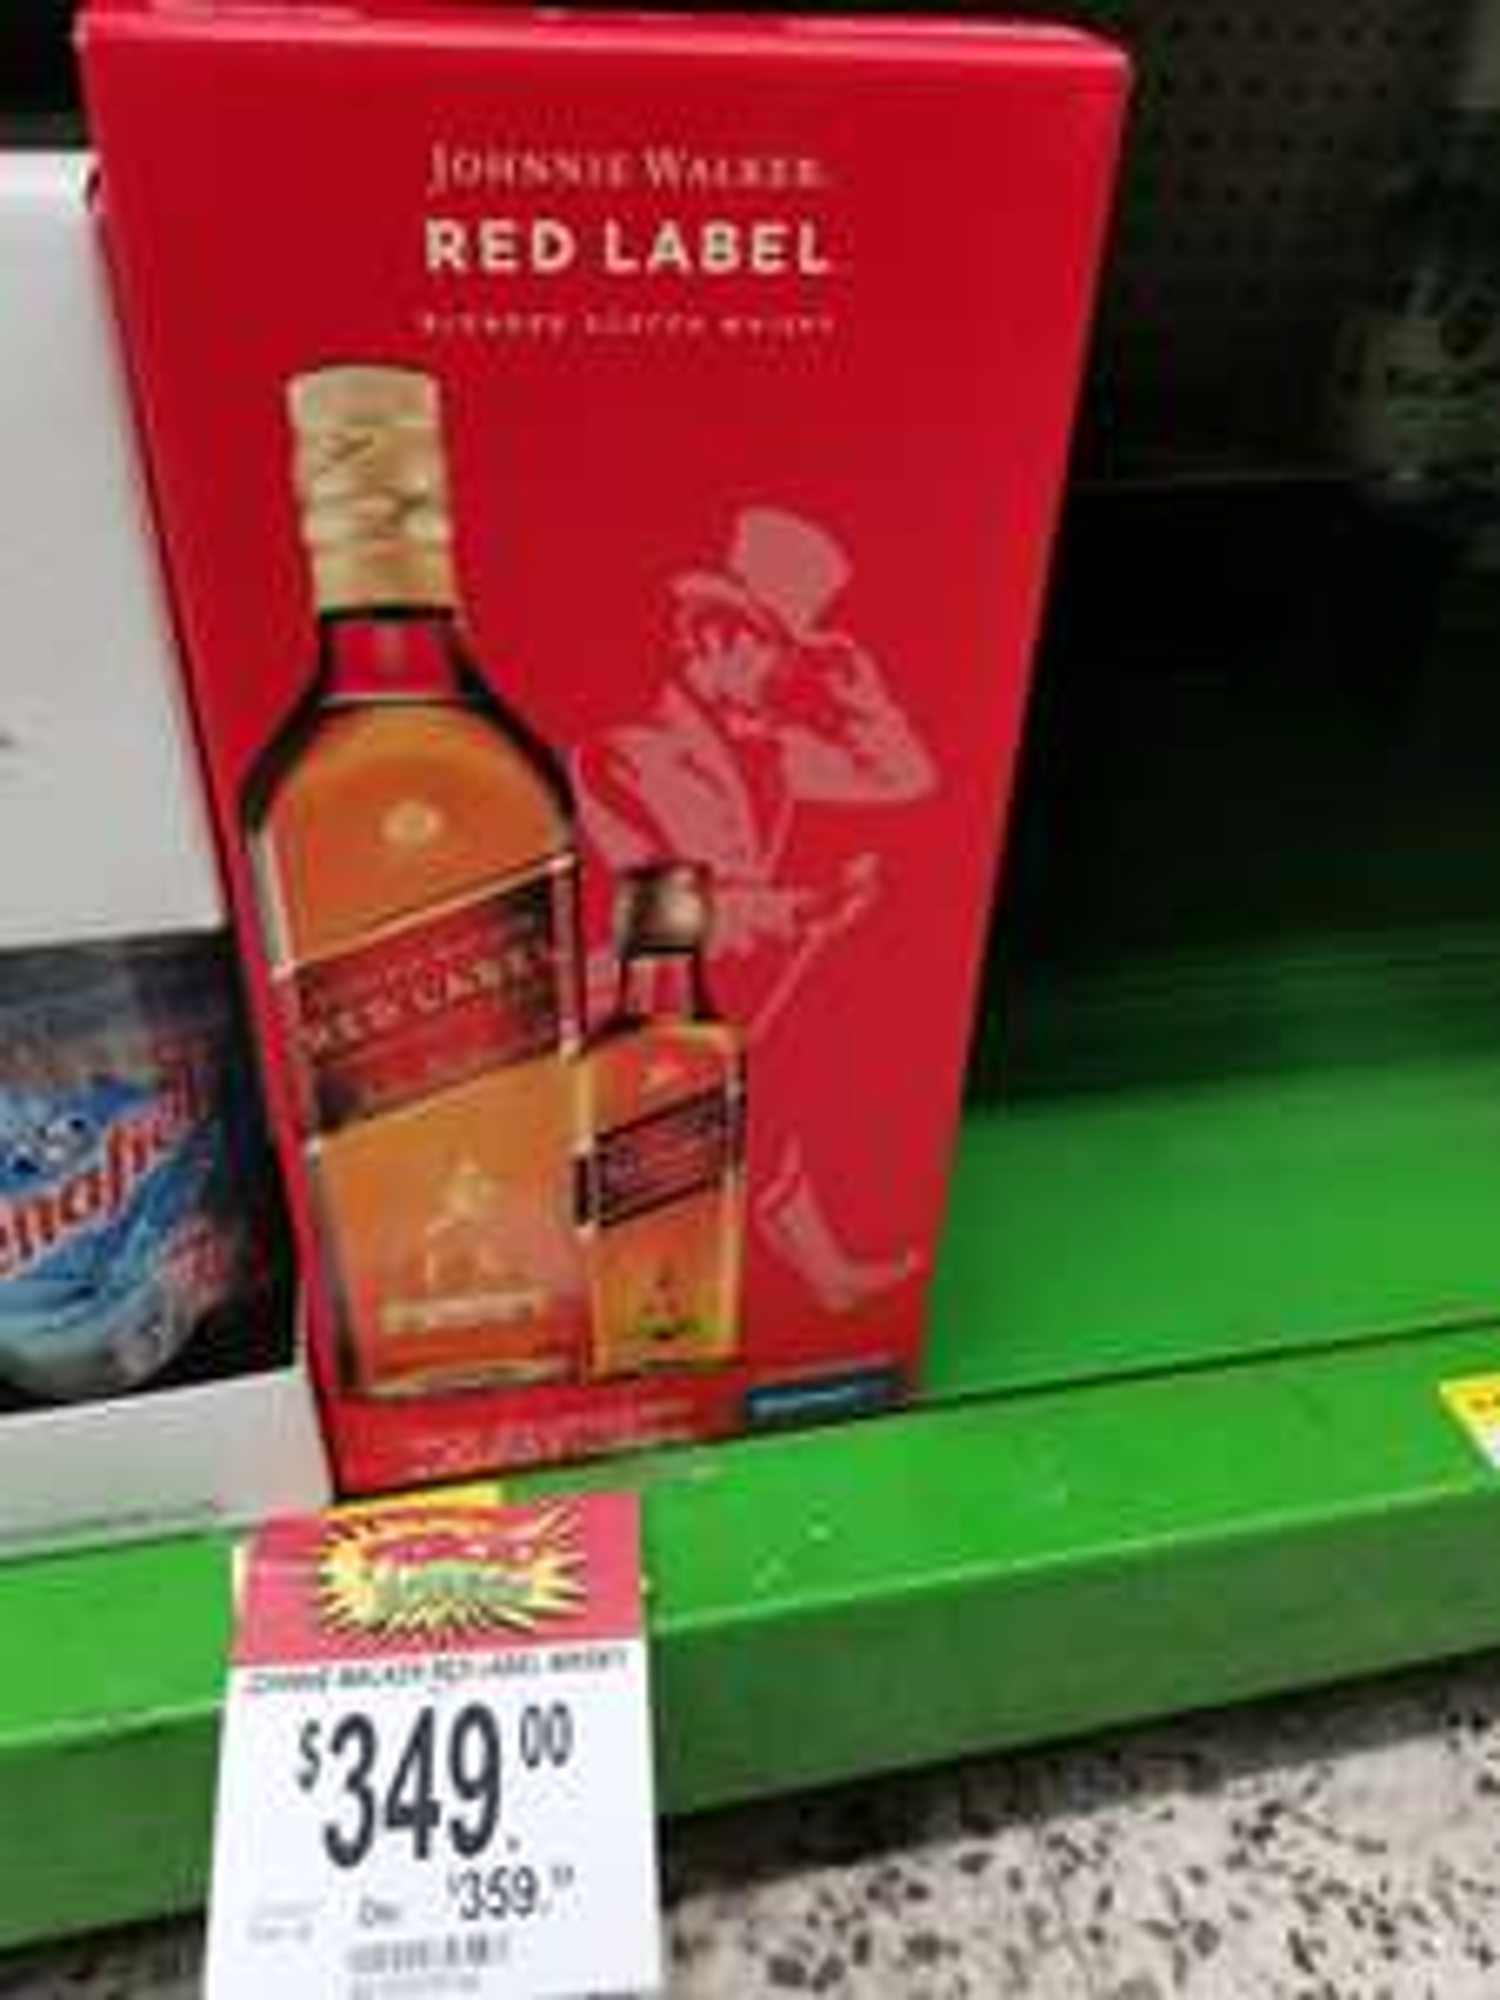 Bodega Aurrera La Viga CDMX: WHISKY JOHNNIE WALKER RED LABEL 1 L + RED LABEL 375 ml